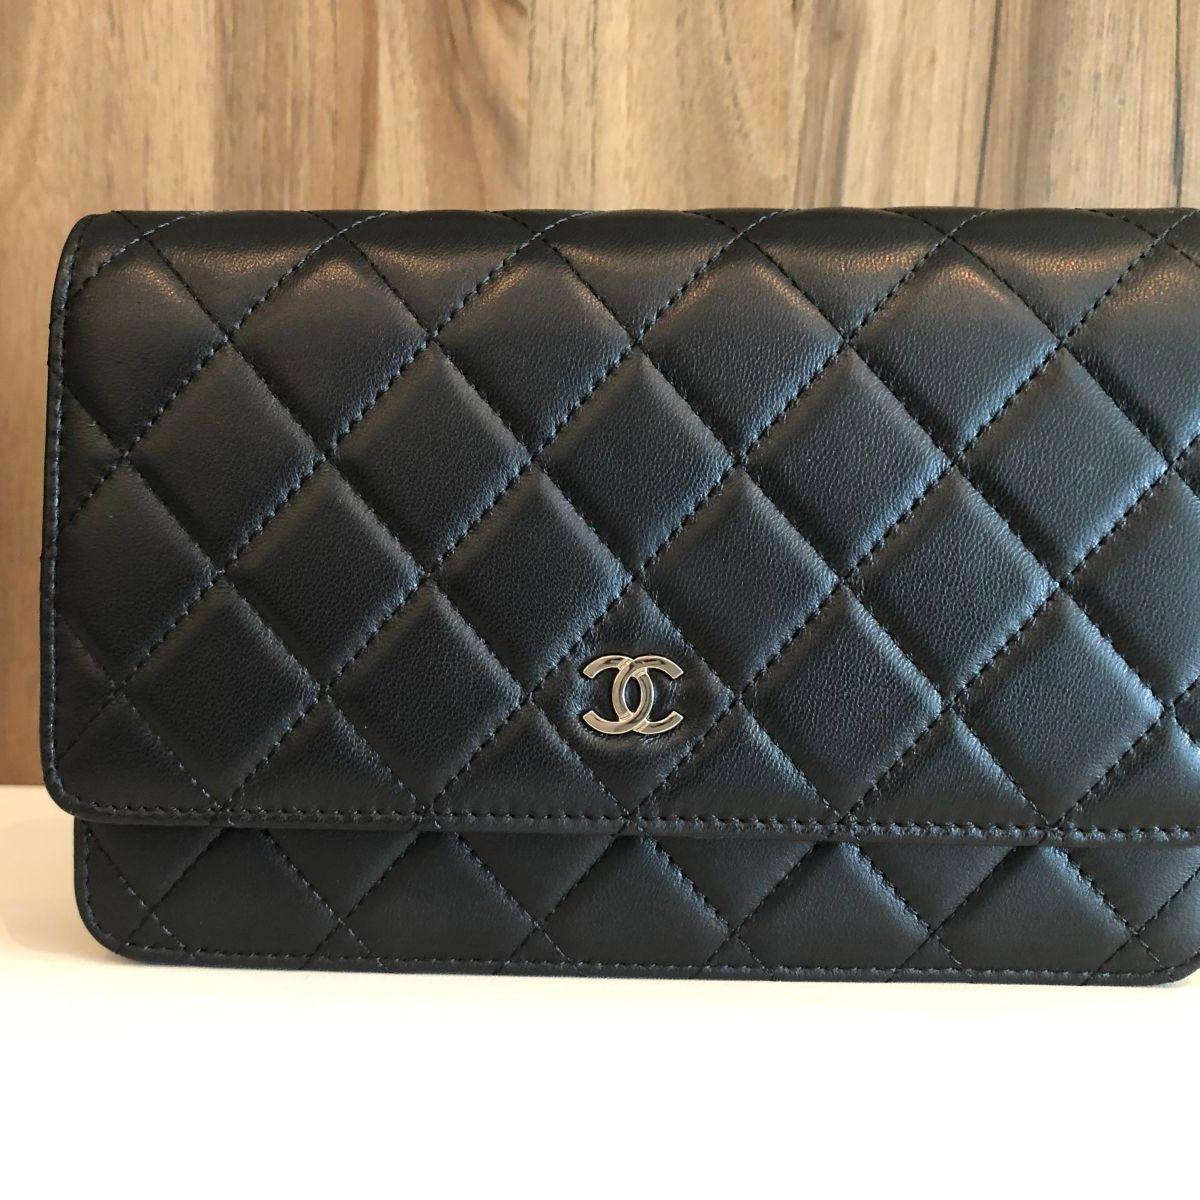 675a427e3 Bolsa Chanel Woc (wallet On Chain) em Lambskin Preto. | Bolsa de Ombro  Feminina Chanel Nunca Usado 31161400 | enjoei